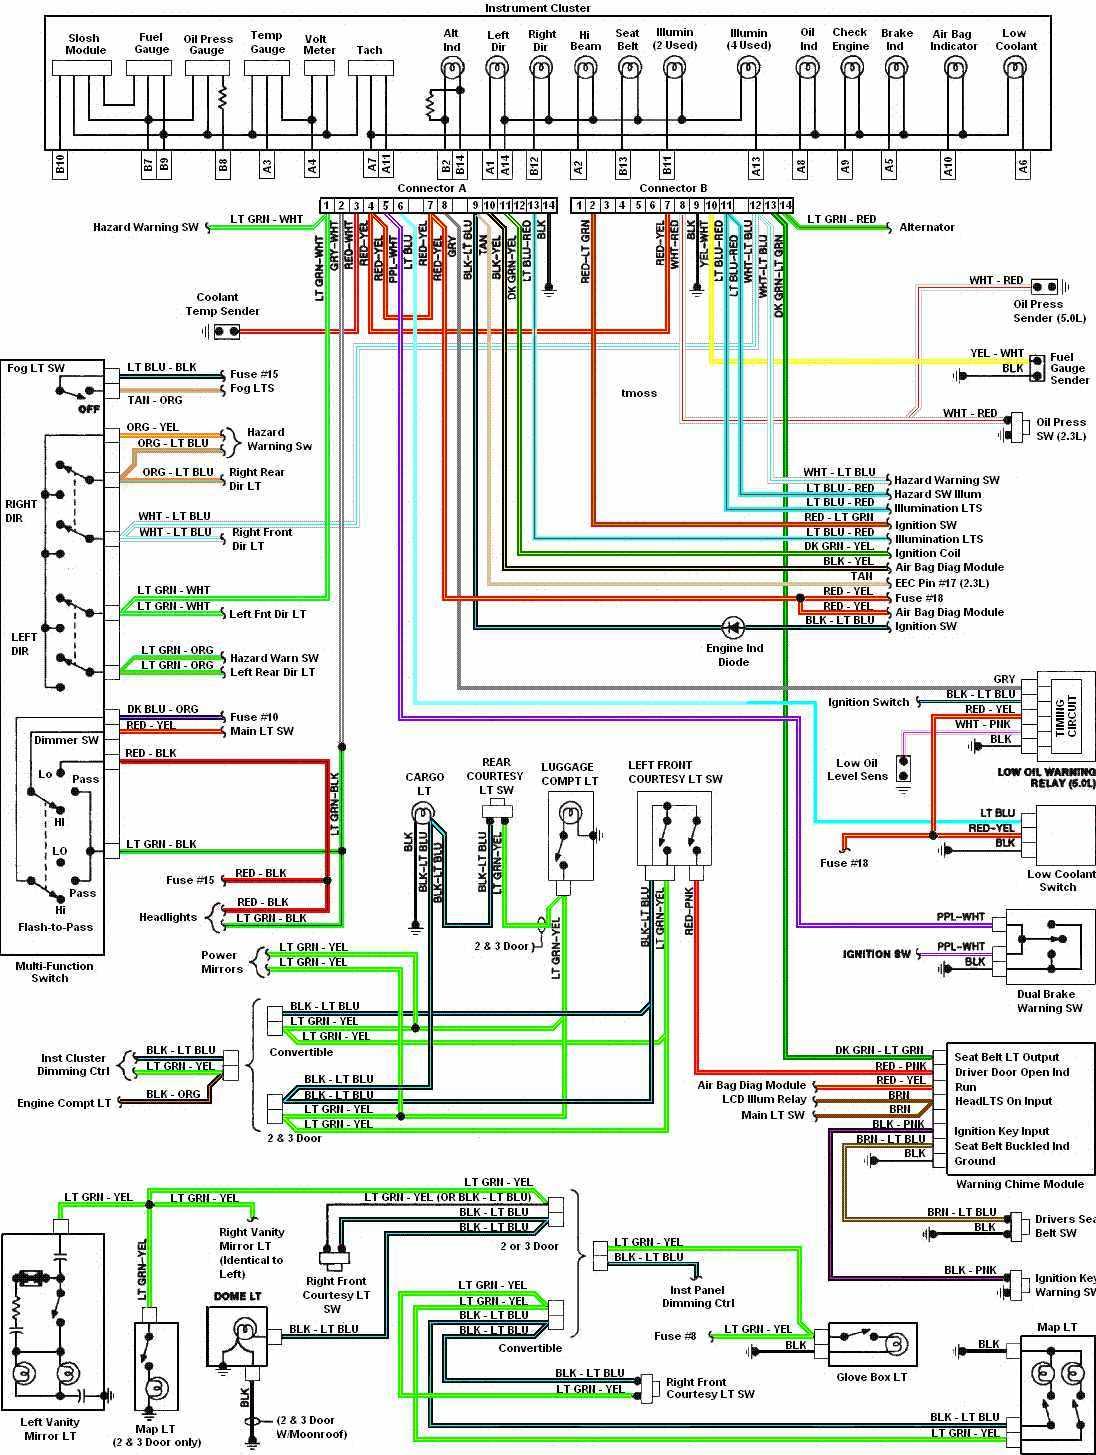 lz_4730] renault clio wiring diagram pdf schematic wiring renault megane window switch wiring diagram 2001 silverado power window wiring diagram alia.shopa.bupi.phot.ndine.aryon.hapolo.mohammedshrine.org